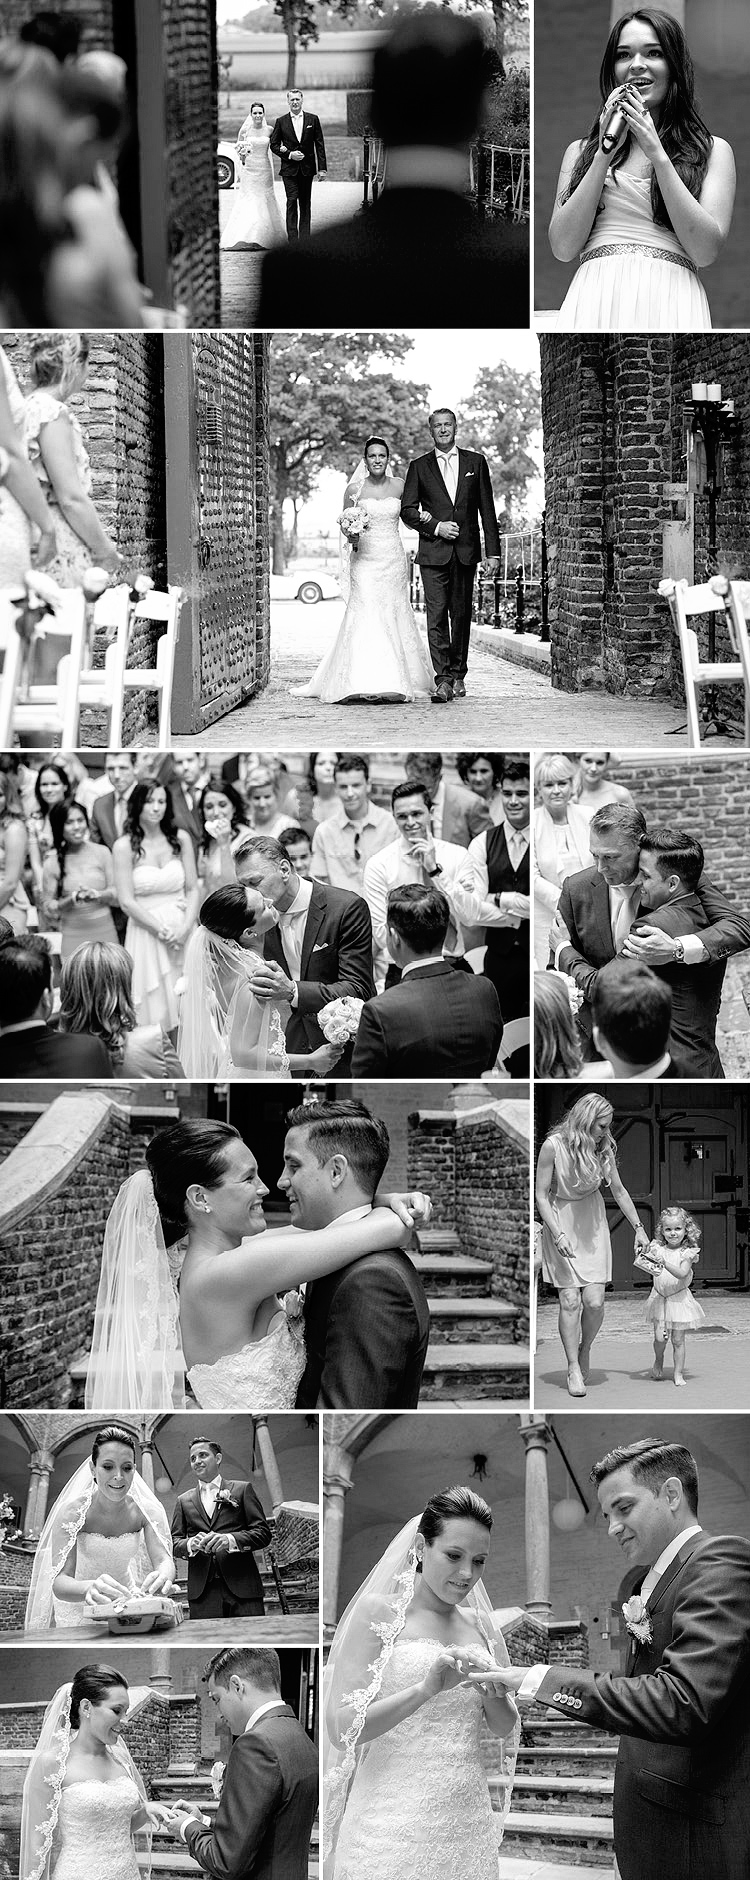 bruidsreportage-blog-willem-nicole-8